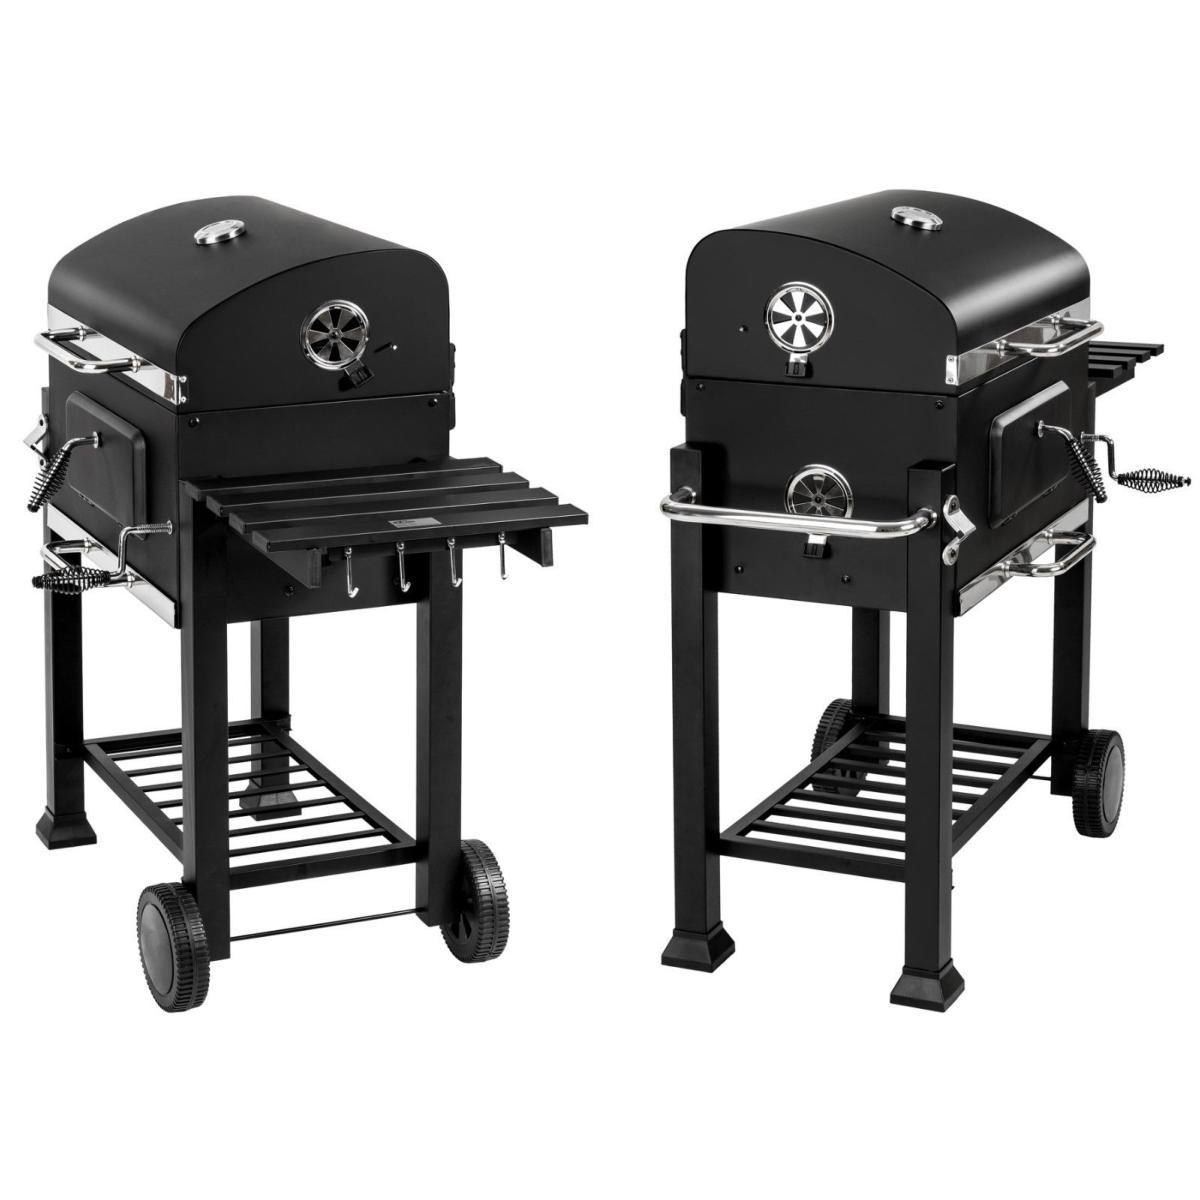 barbecue multifonctions acier inoxydable charbon de bois. Black Bedroom Furniture Sets. Home Design Ideas